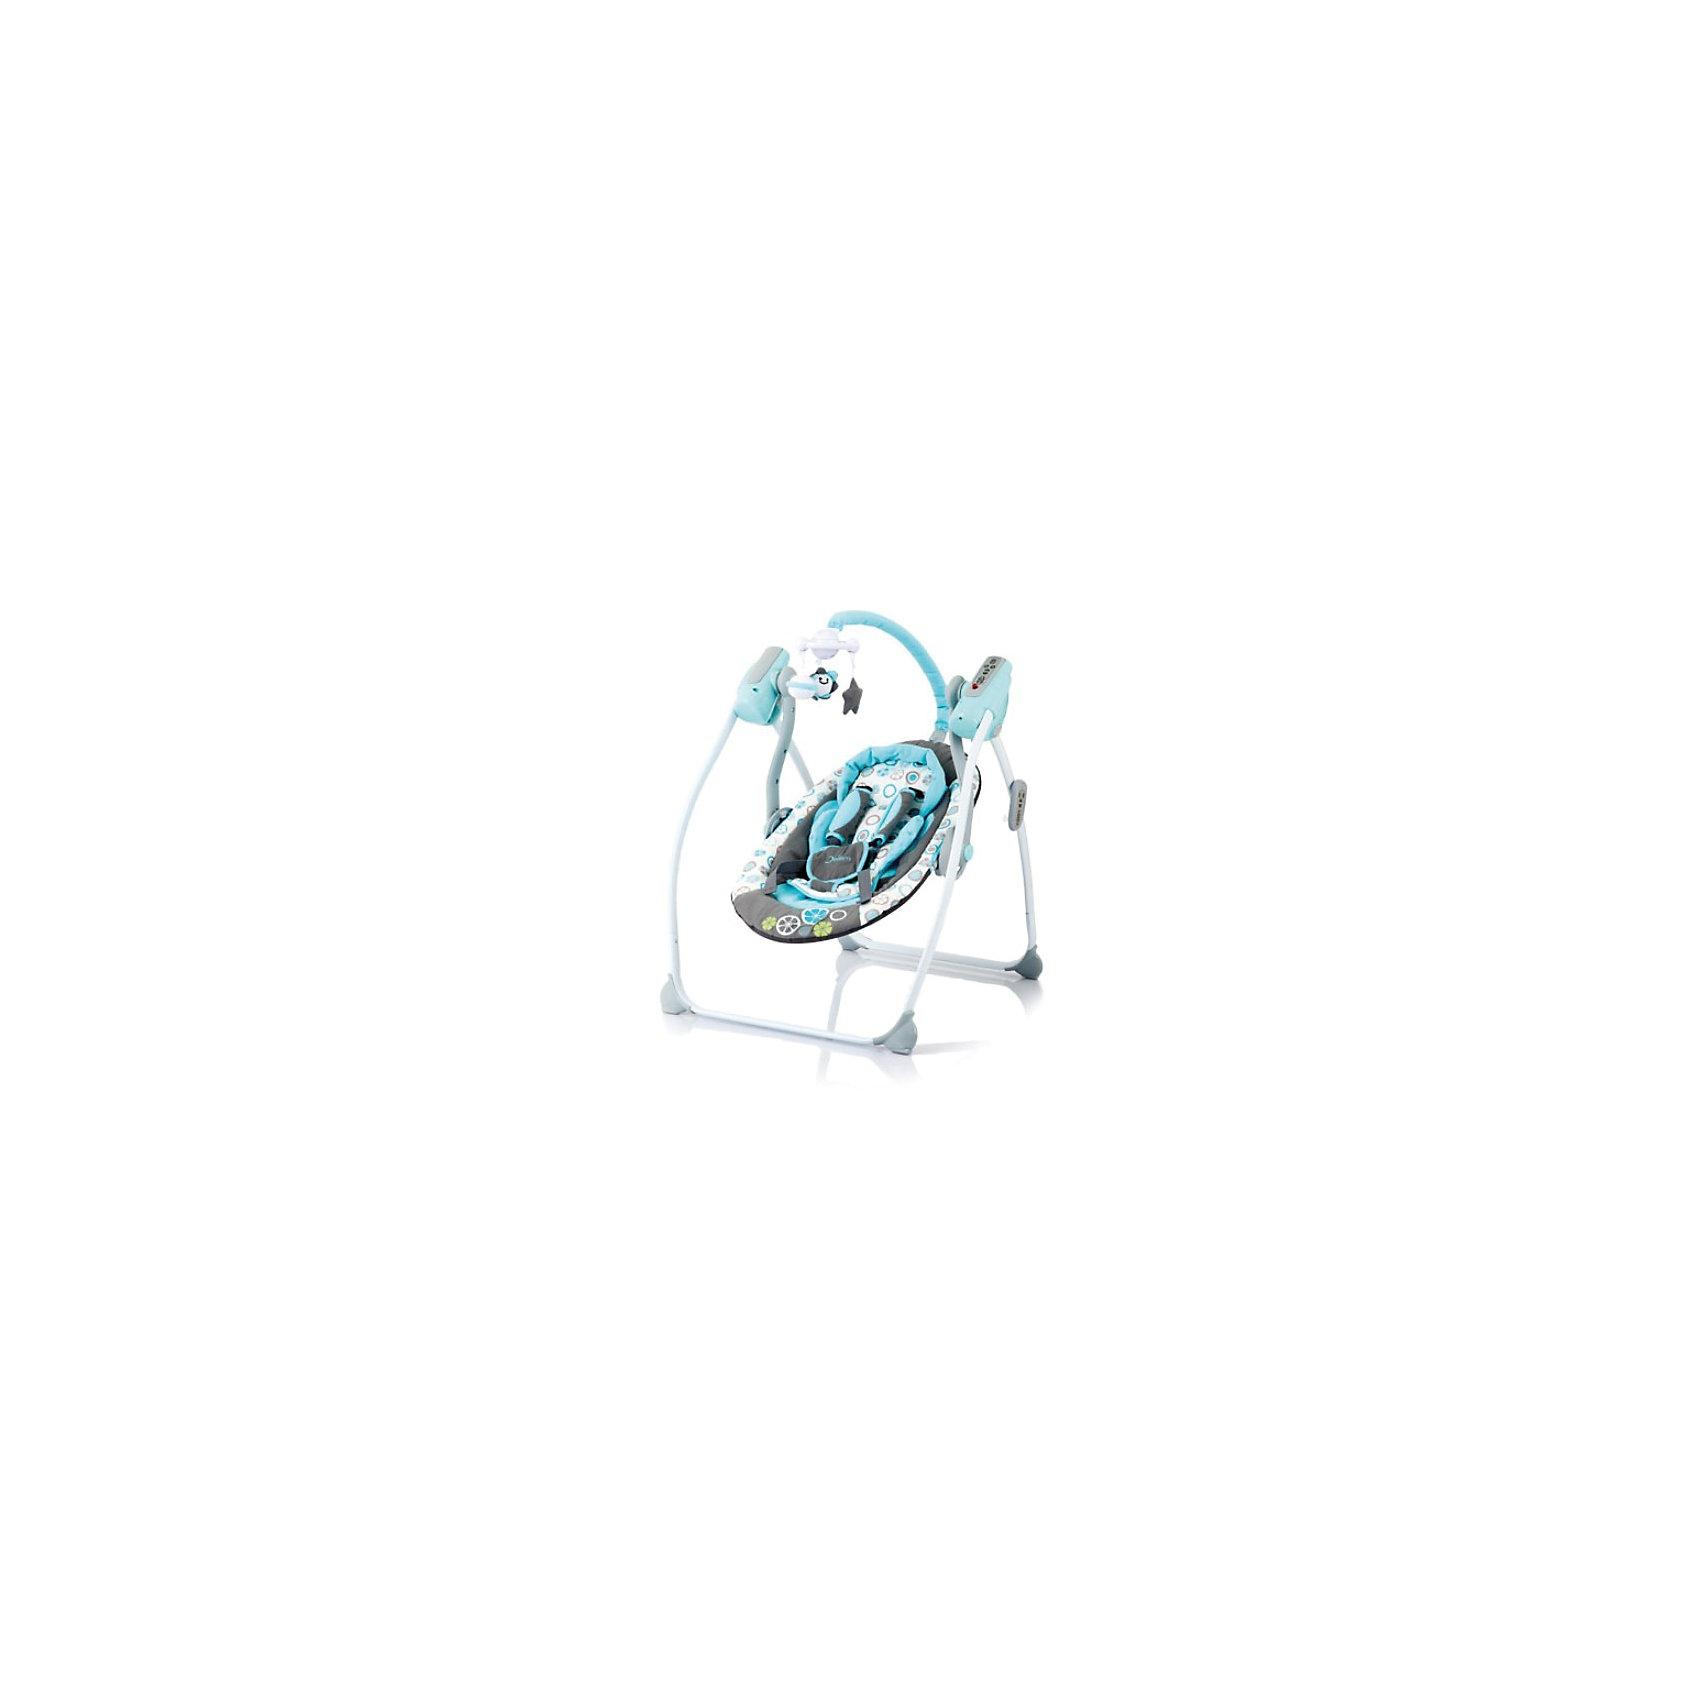 Электрокачели Breeze с адаптером, Jetem, серый/голубой